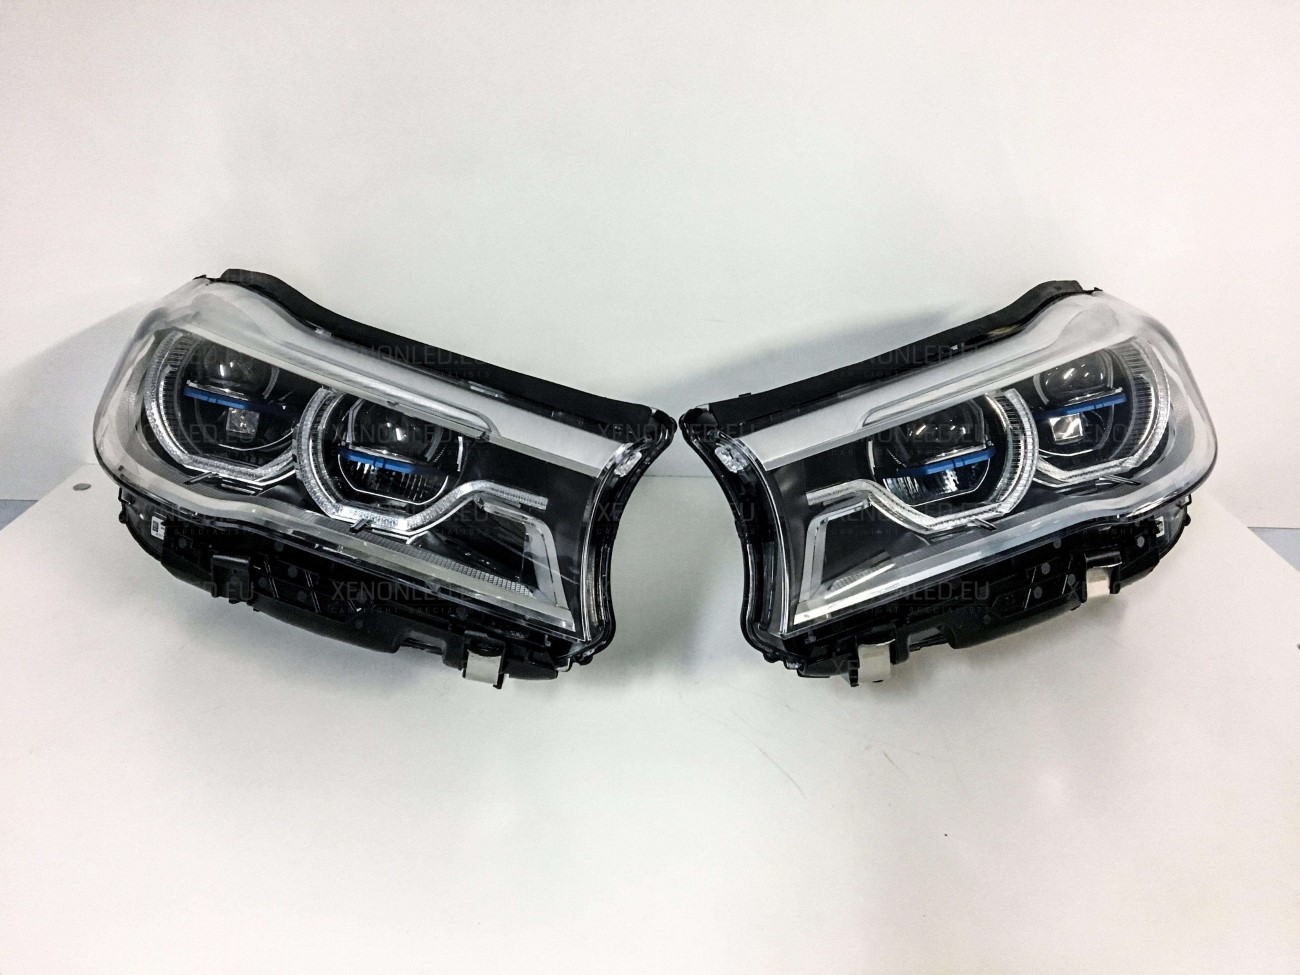 Bmw G11 G12 7 Series 2016 Laser Light Headlights Xenonled Eu